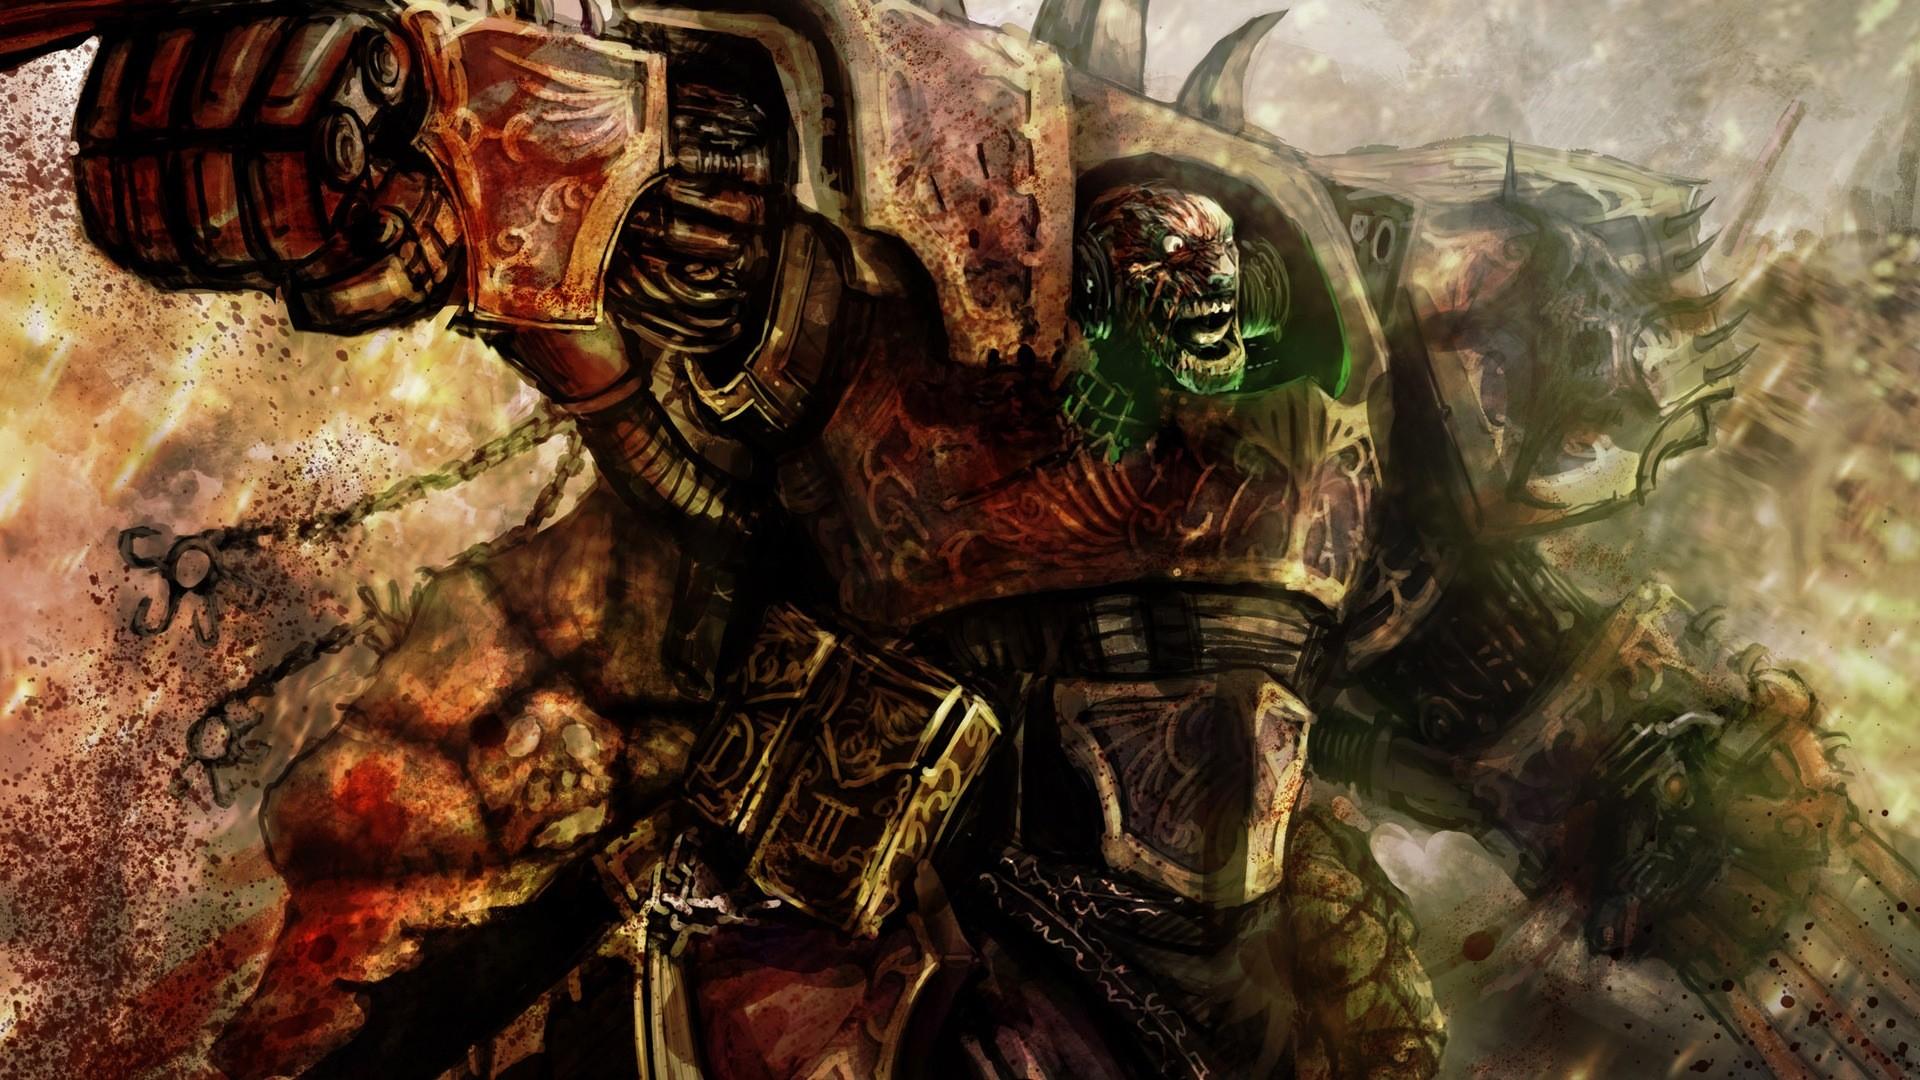 Artwork chaos space marine Warhammer 40k wallpaper ...